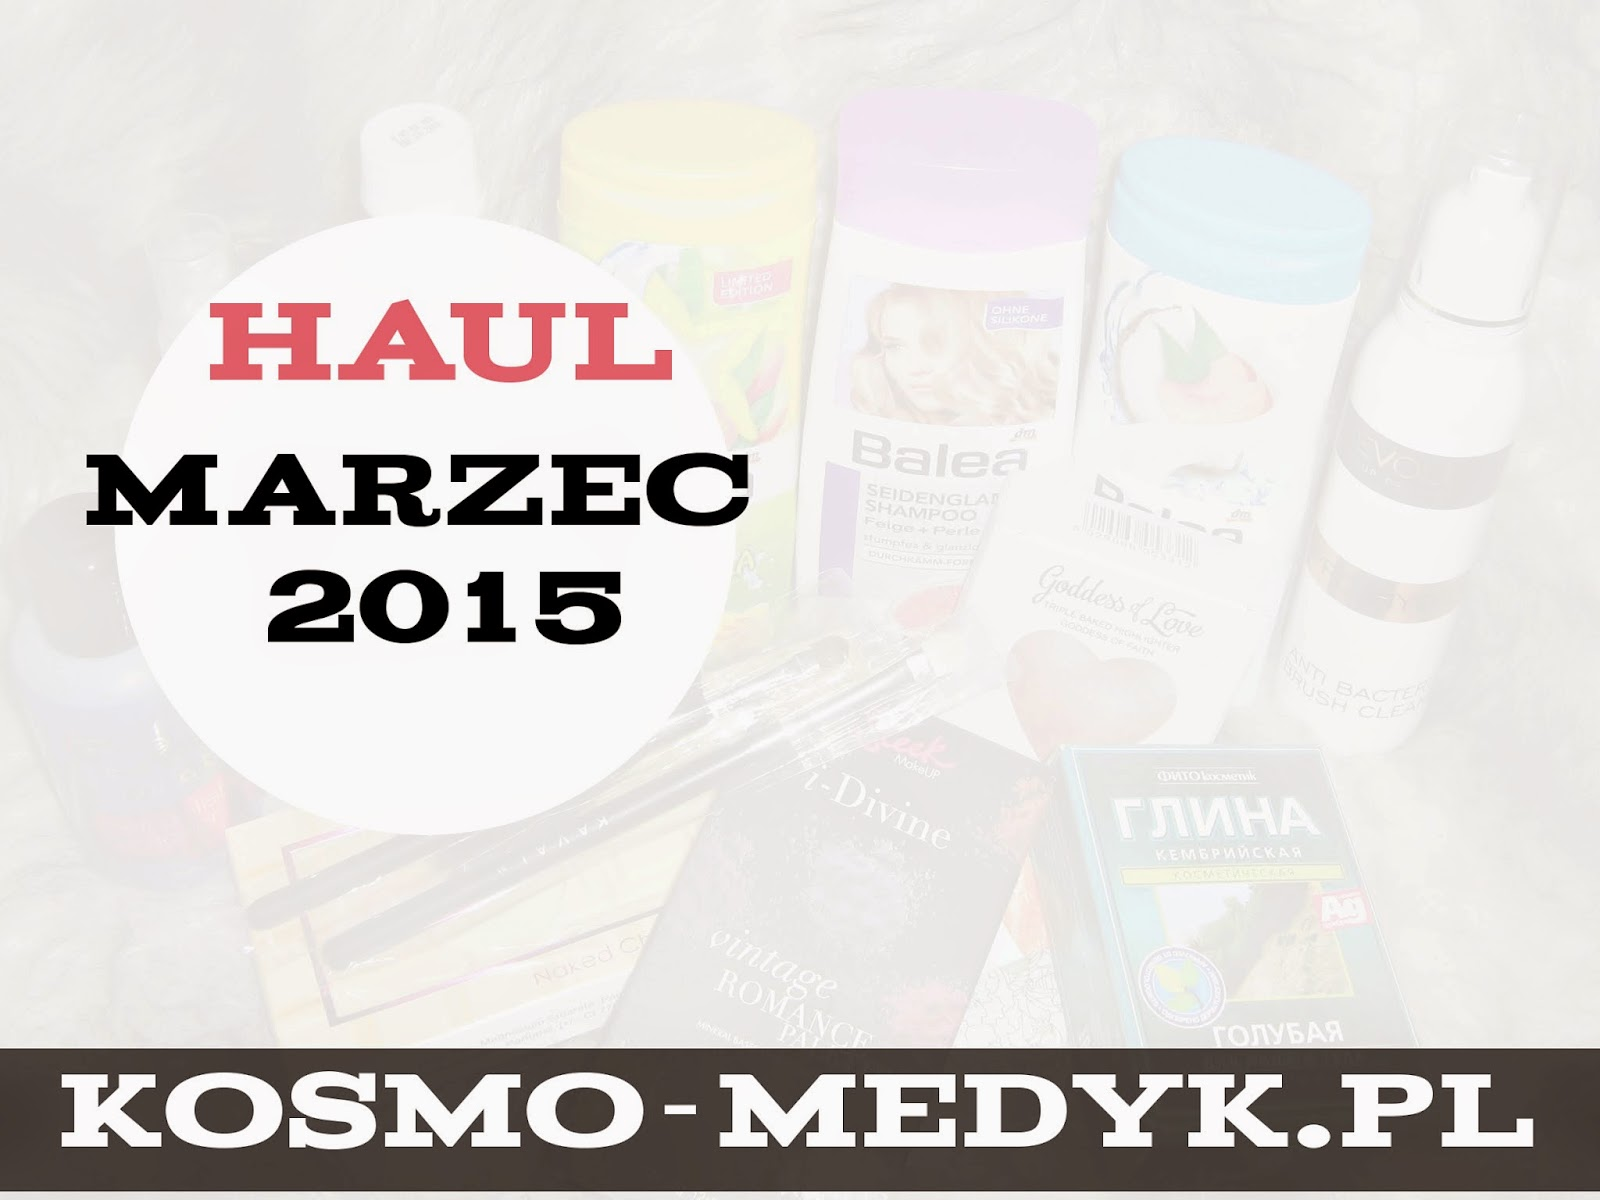 Haul Marzec 2015 - Kavai, Cytrynowa, Cocolita.